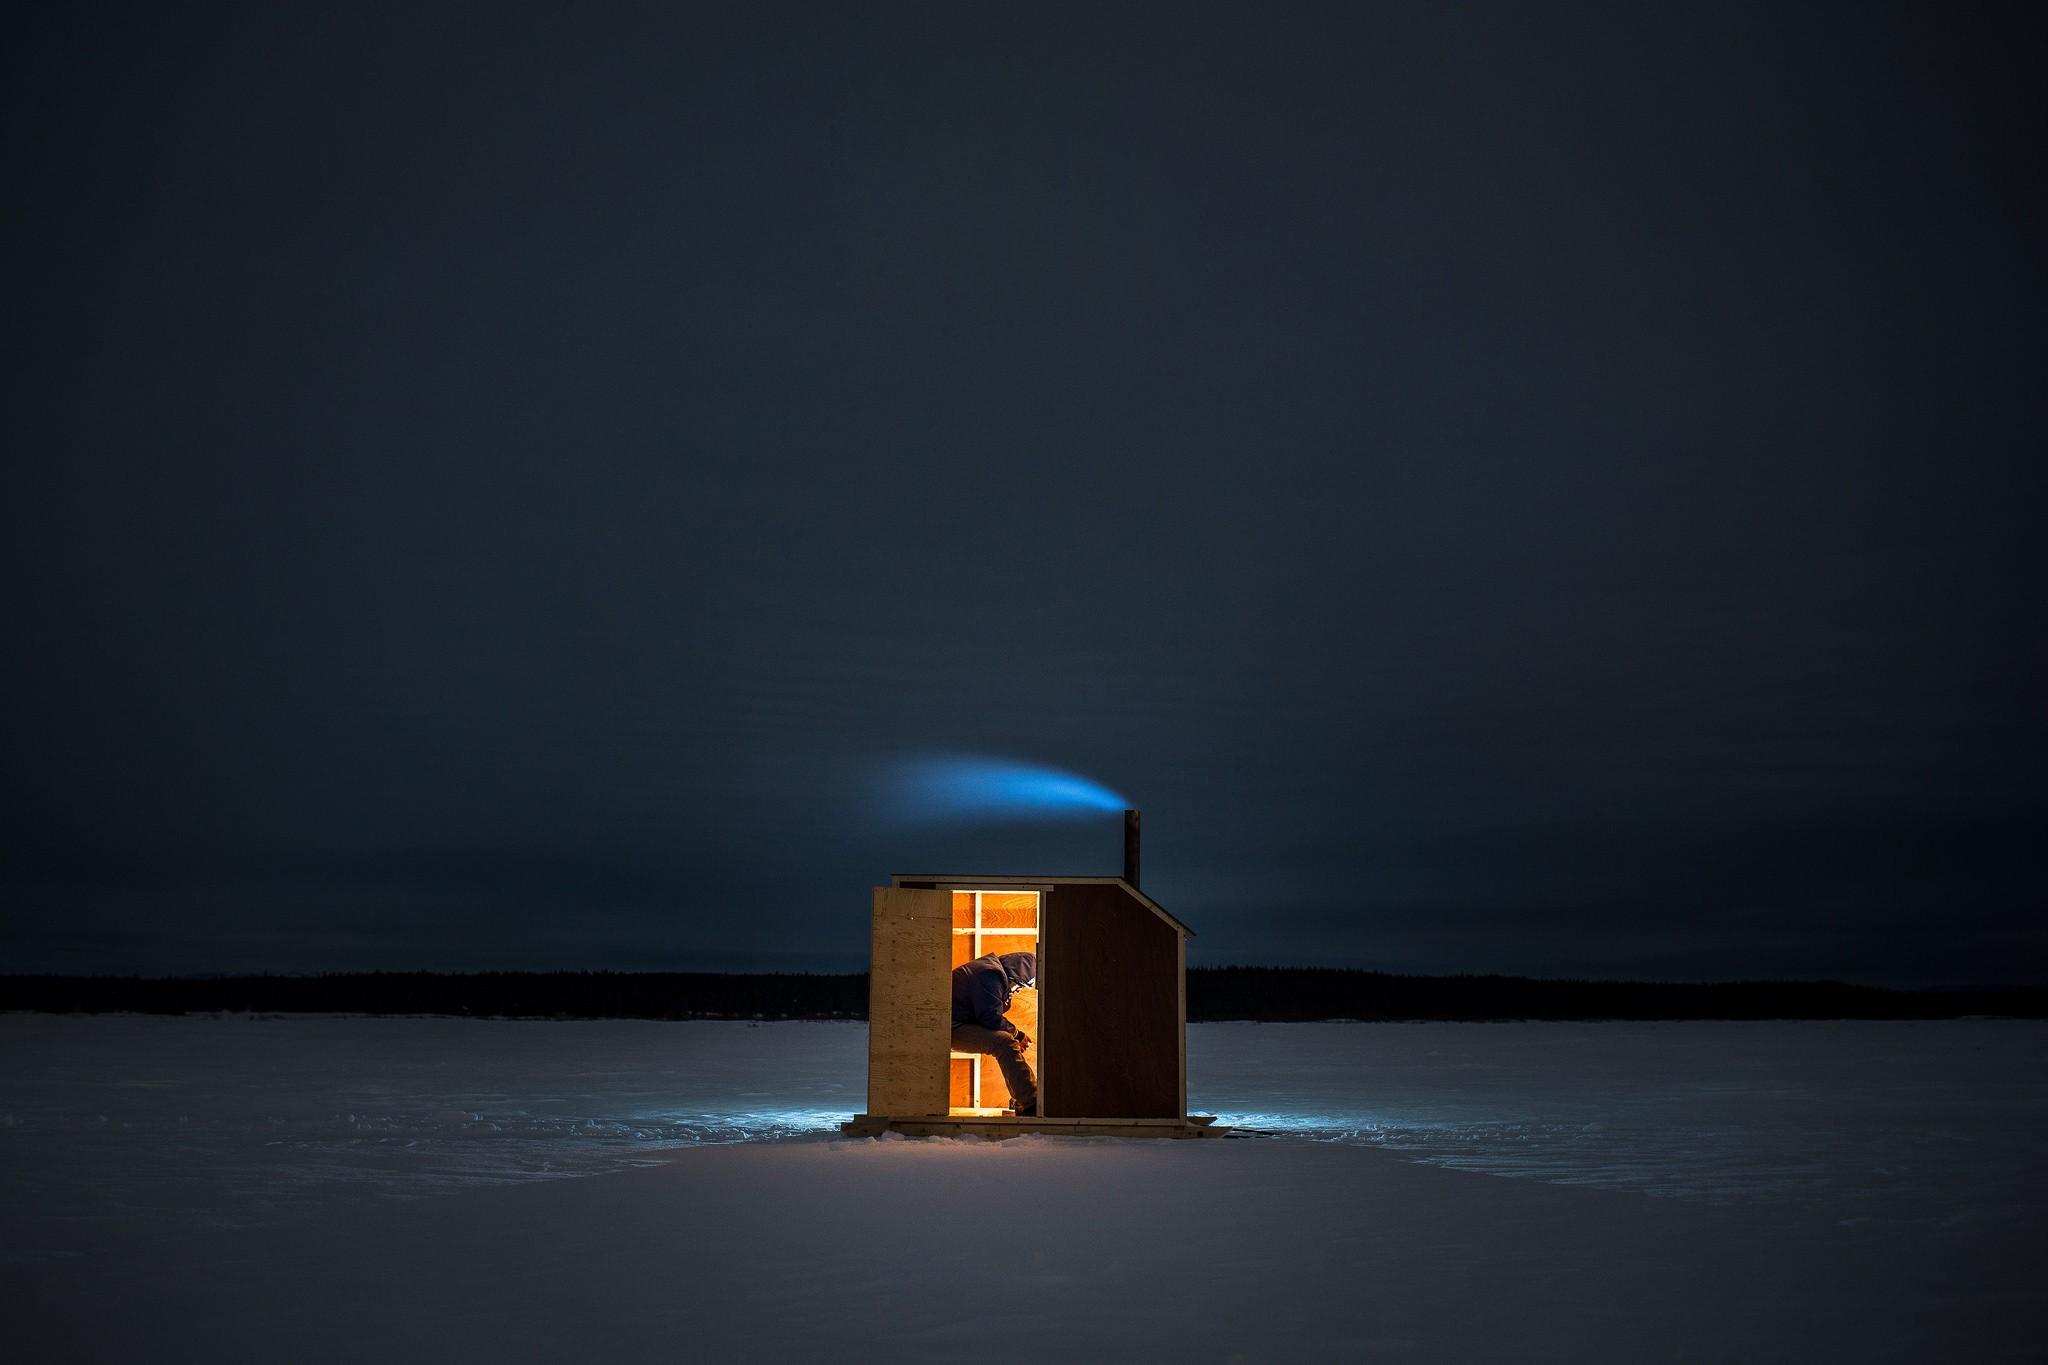 Wonderful Wallpaper Night Landscape - 2048x1365-px-alone-ice-ice-fishing-landscape-night-people-1105046  Graphic-813341.jpg